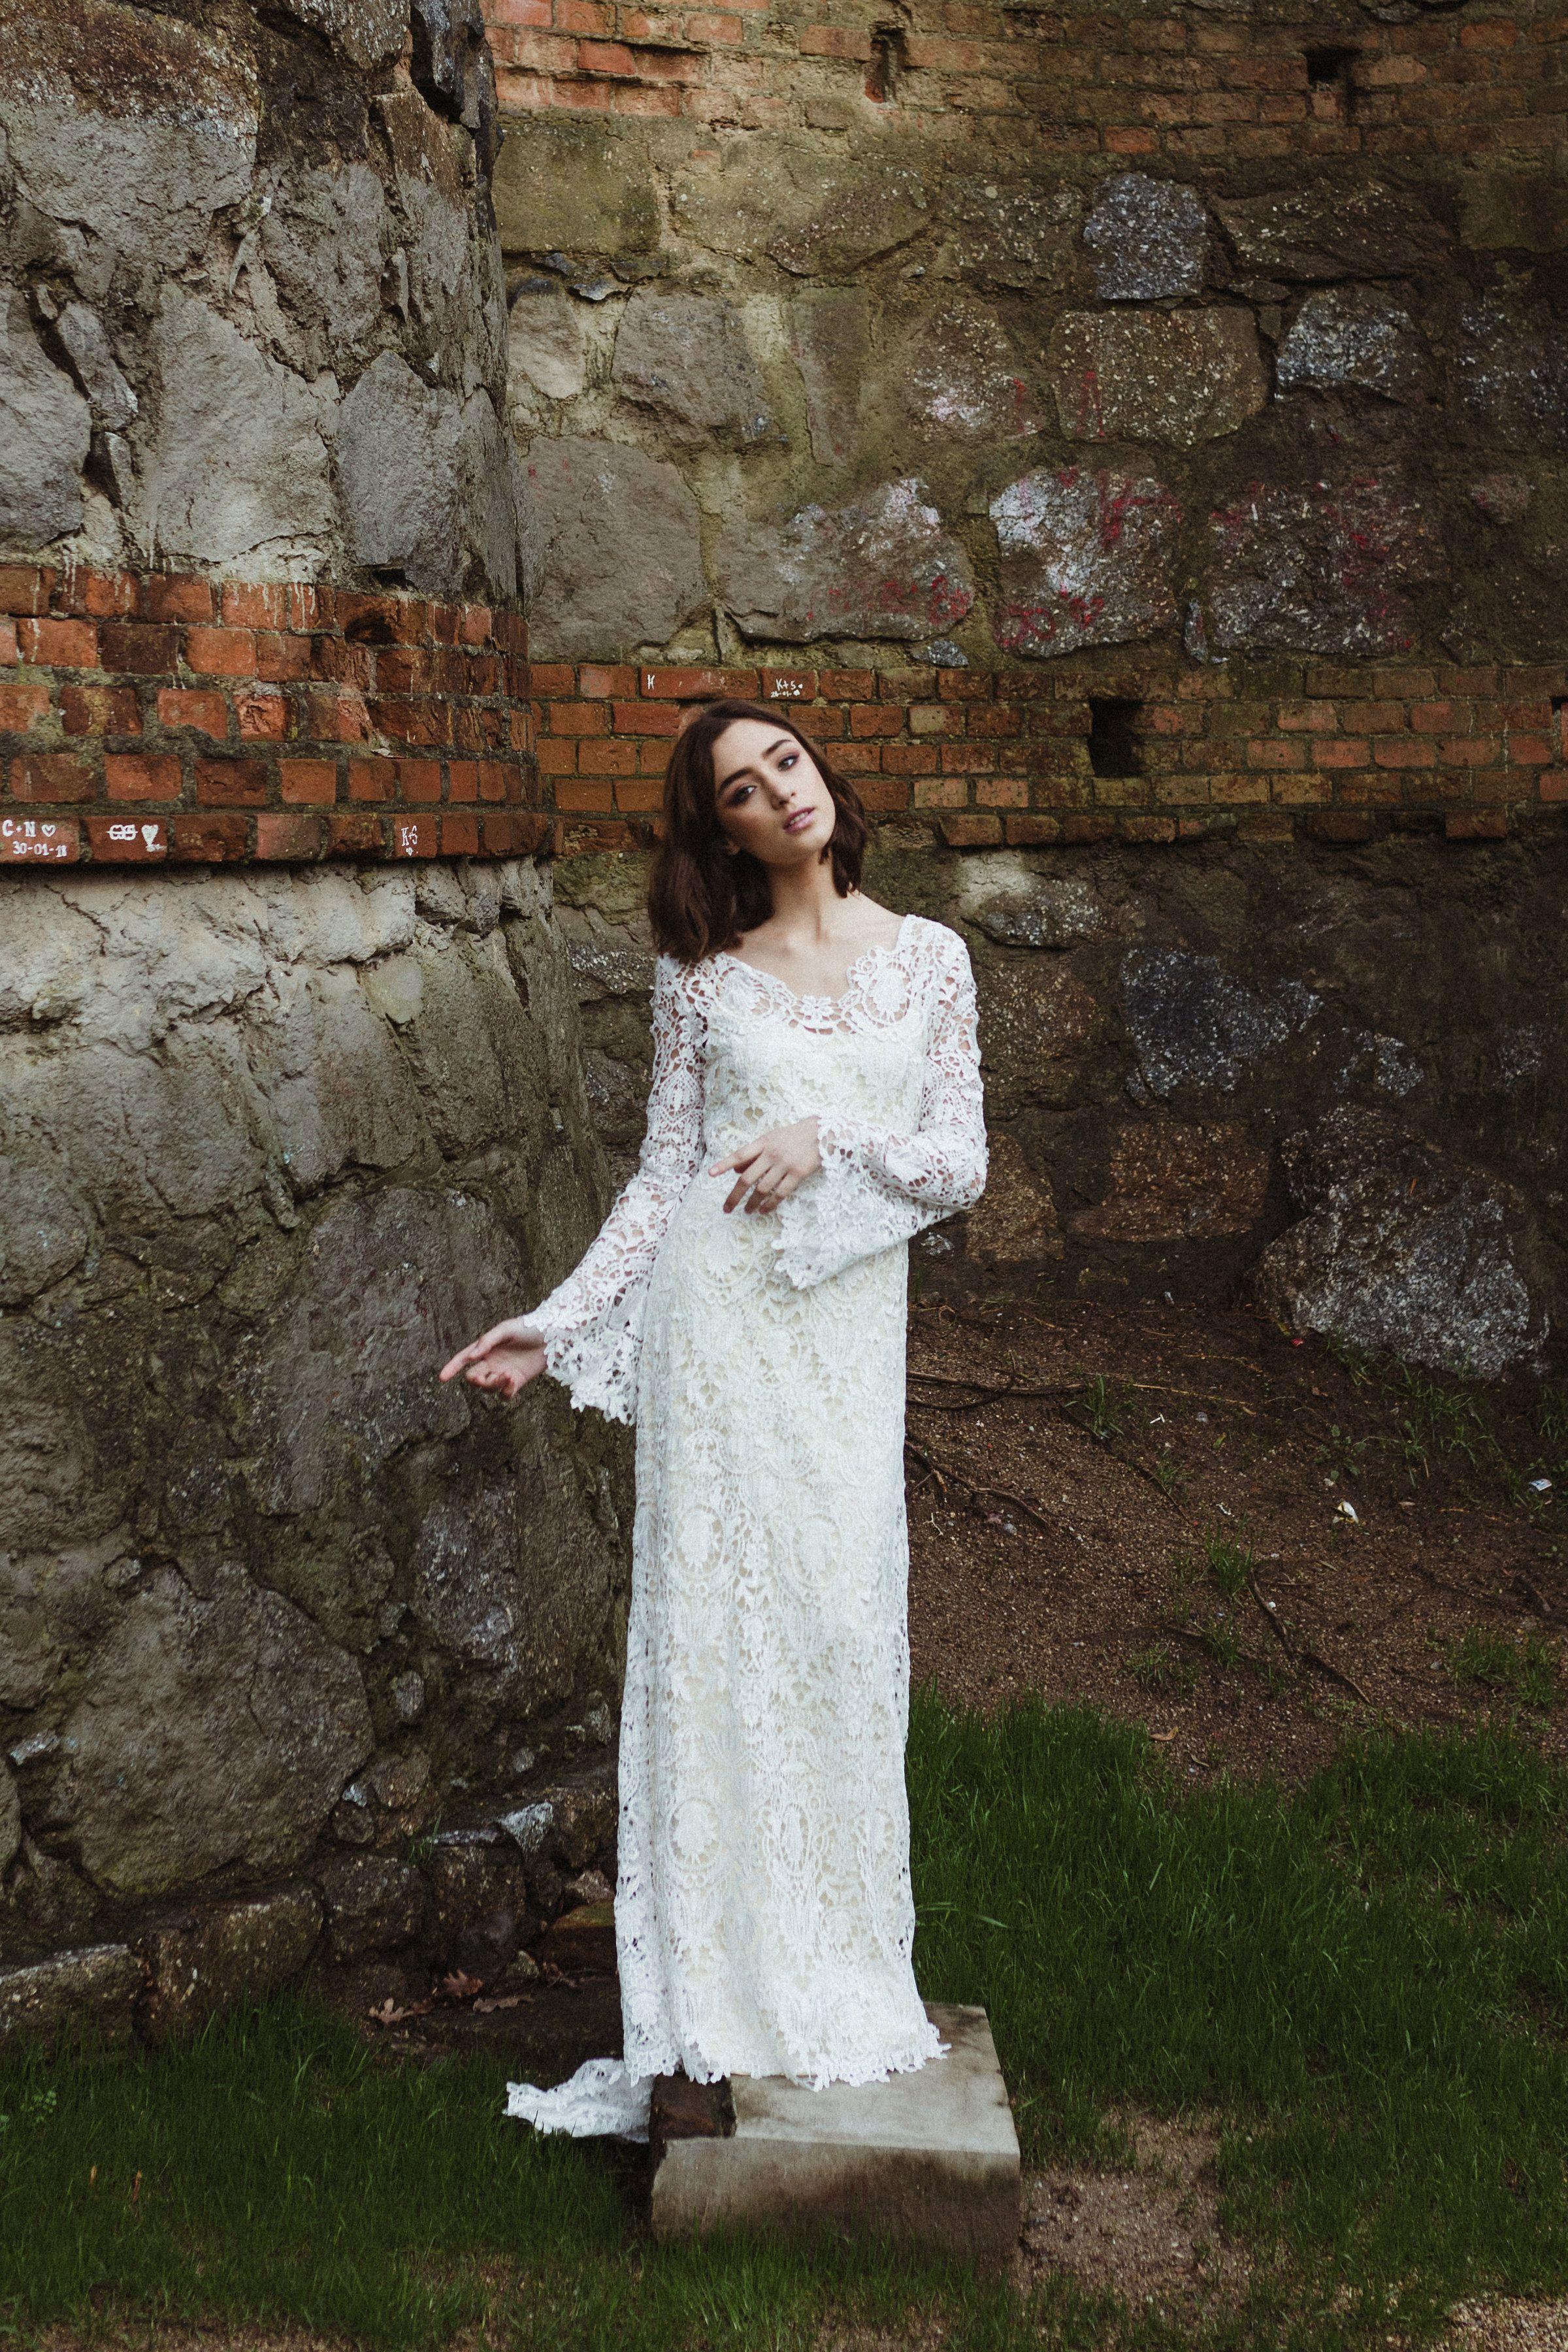 Modest long sleeve lace wedding dresses  Aquarius gown by Elizabeth Cooper Design  Photo by Ricardo Quintana